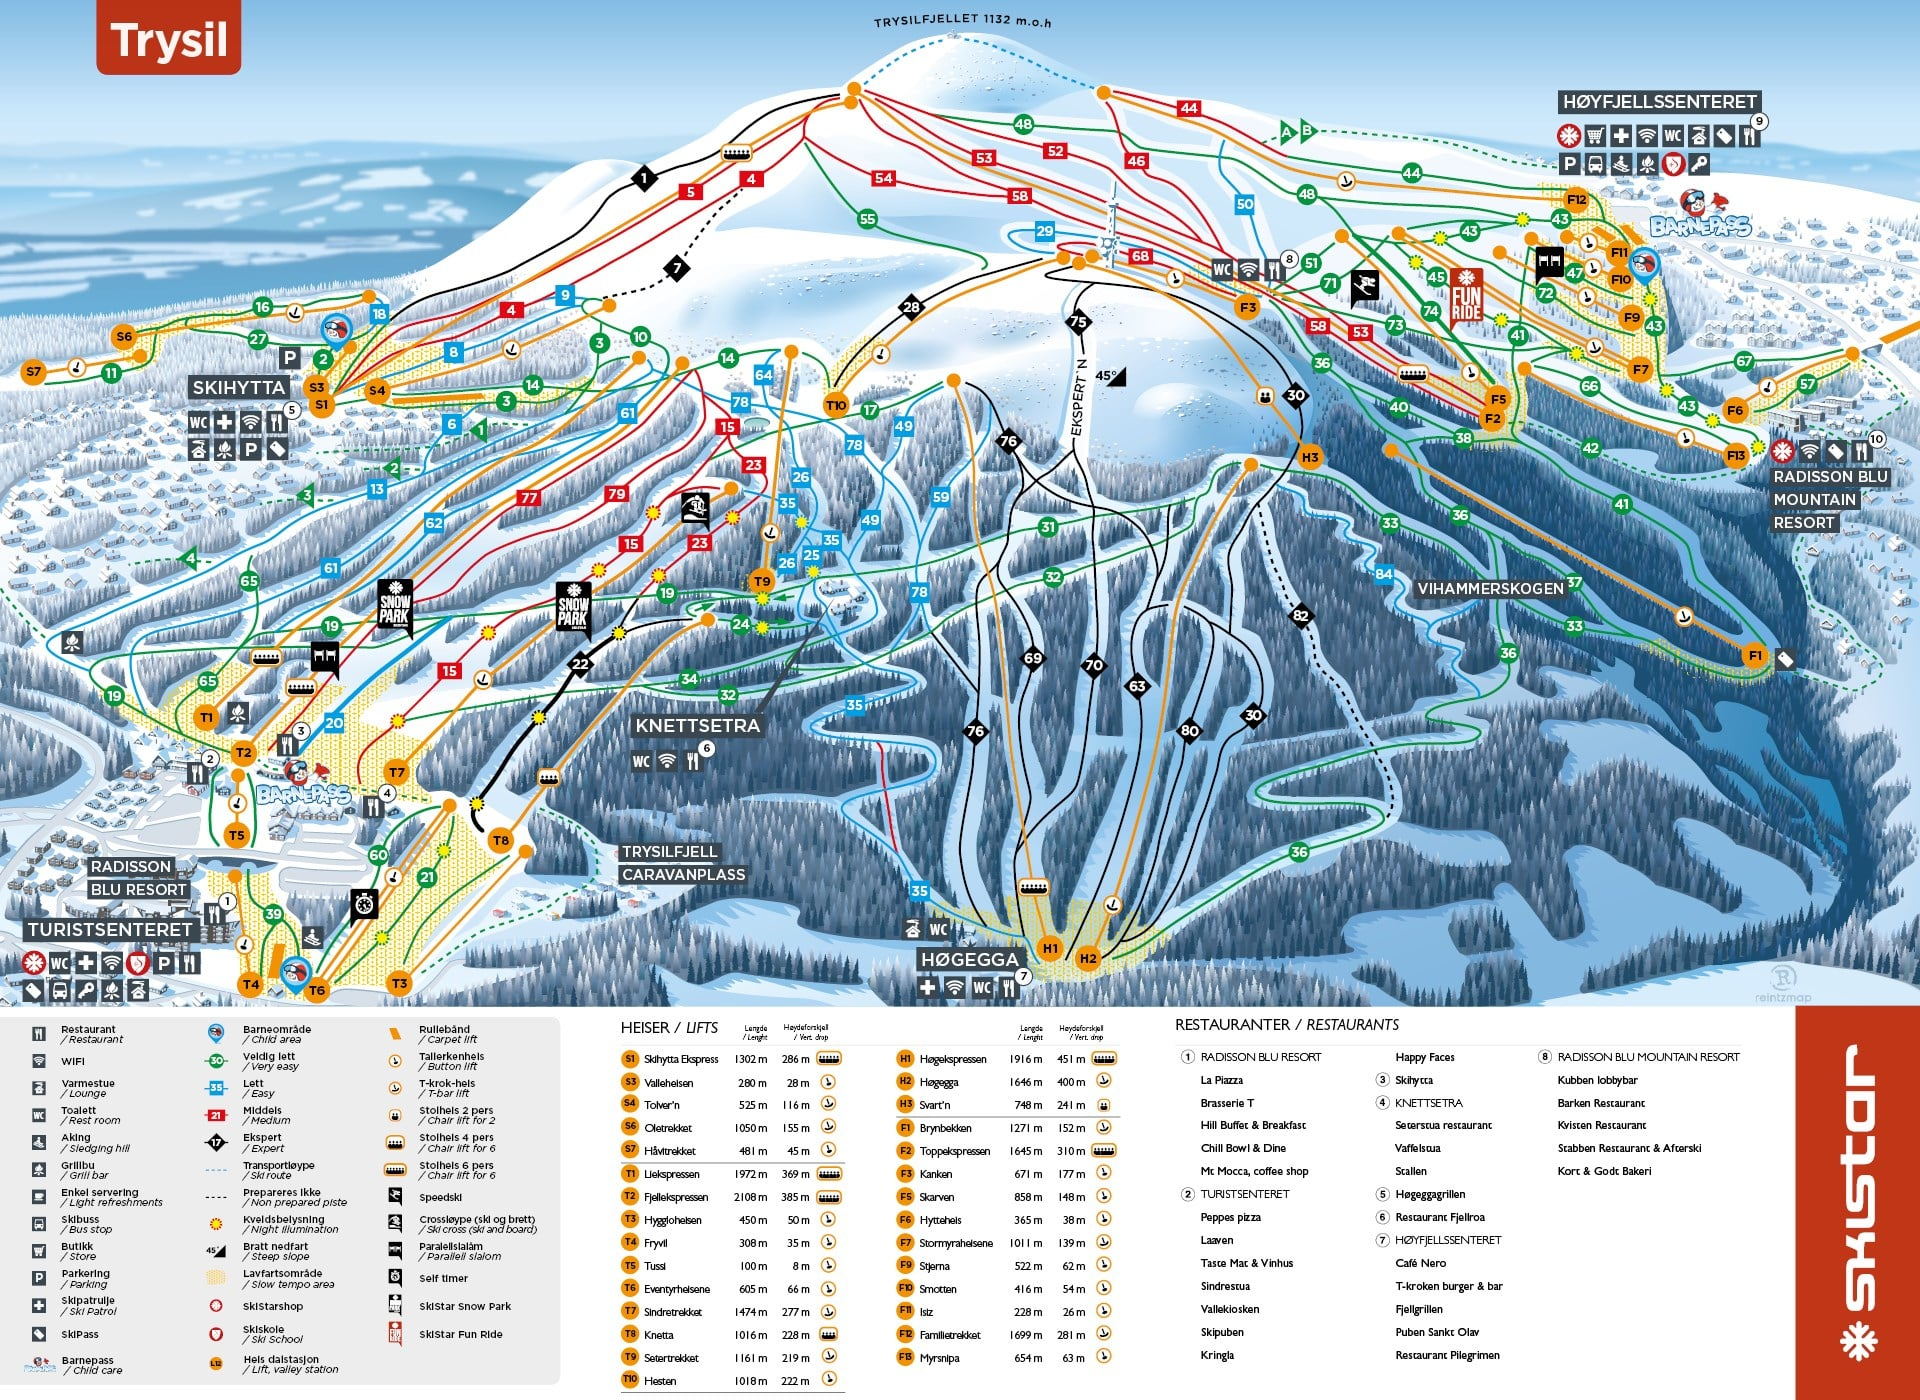 Trysil Piste / Trail Map